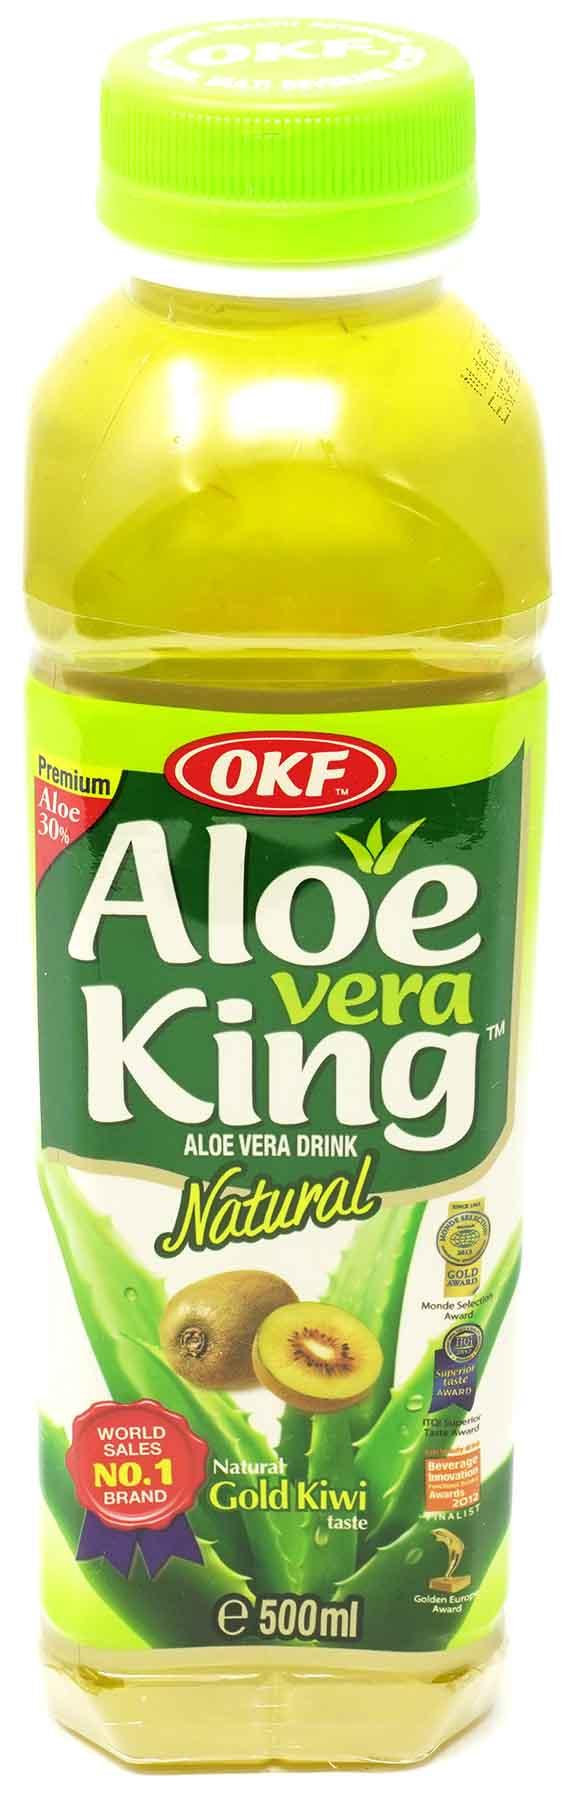 OKF Aloe Vera King Kiwi Getränk, 500 ml